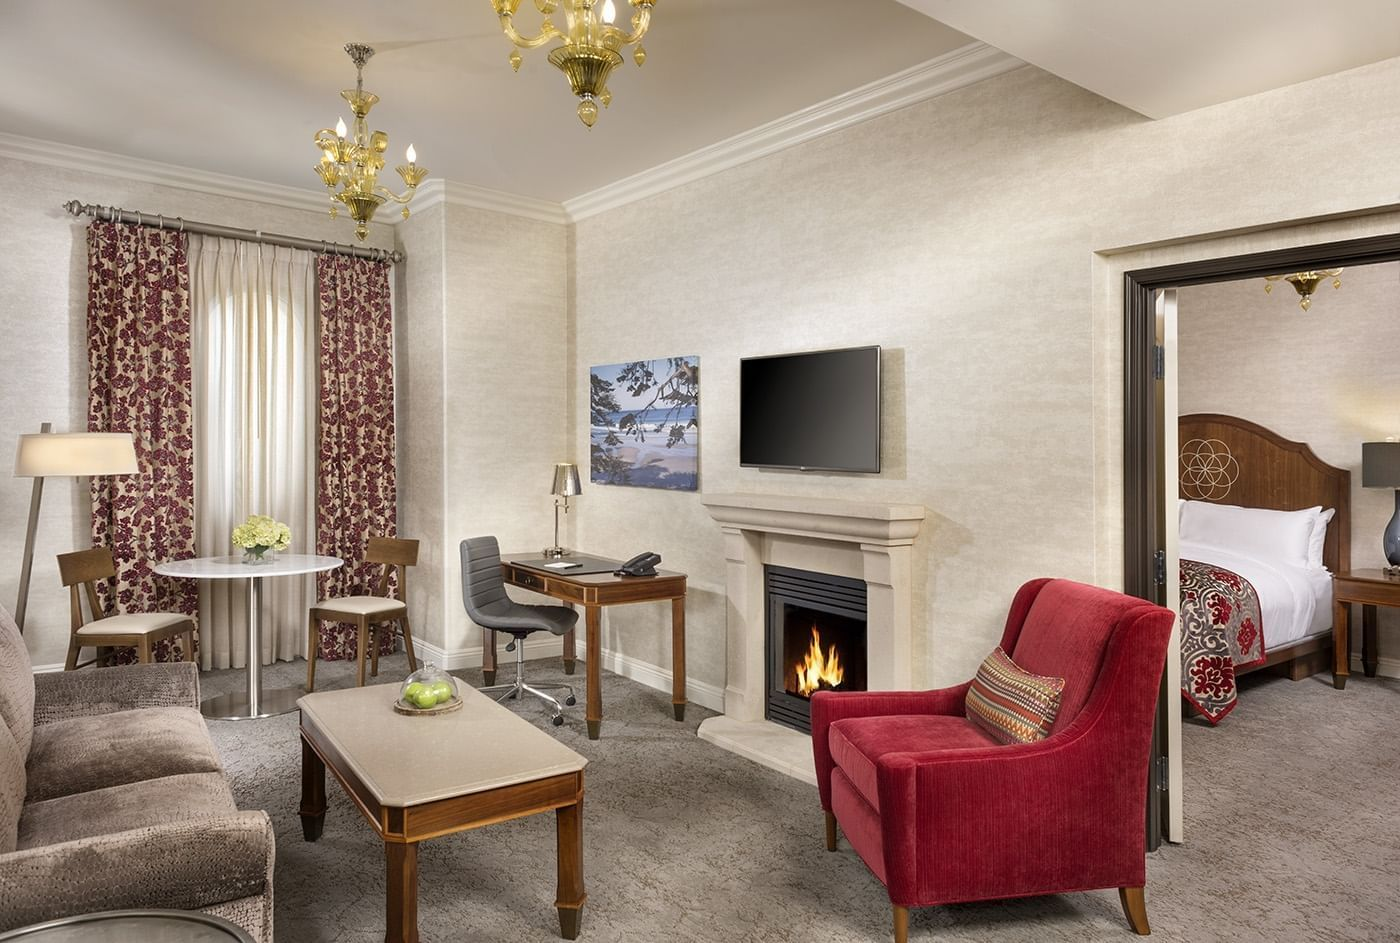 Suite at Allegretto Vineyard Resort in Paso Robles